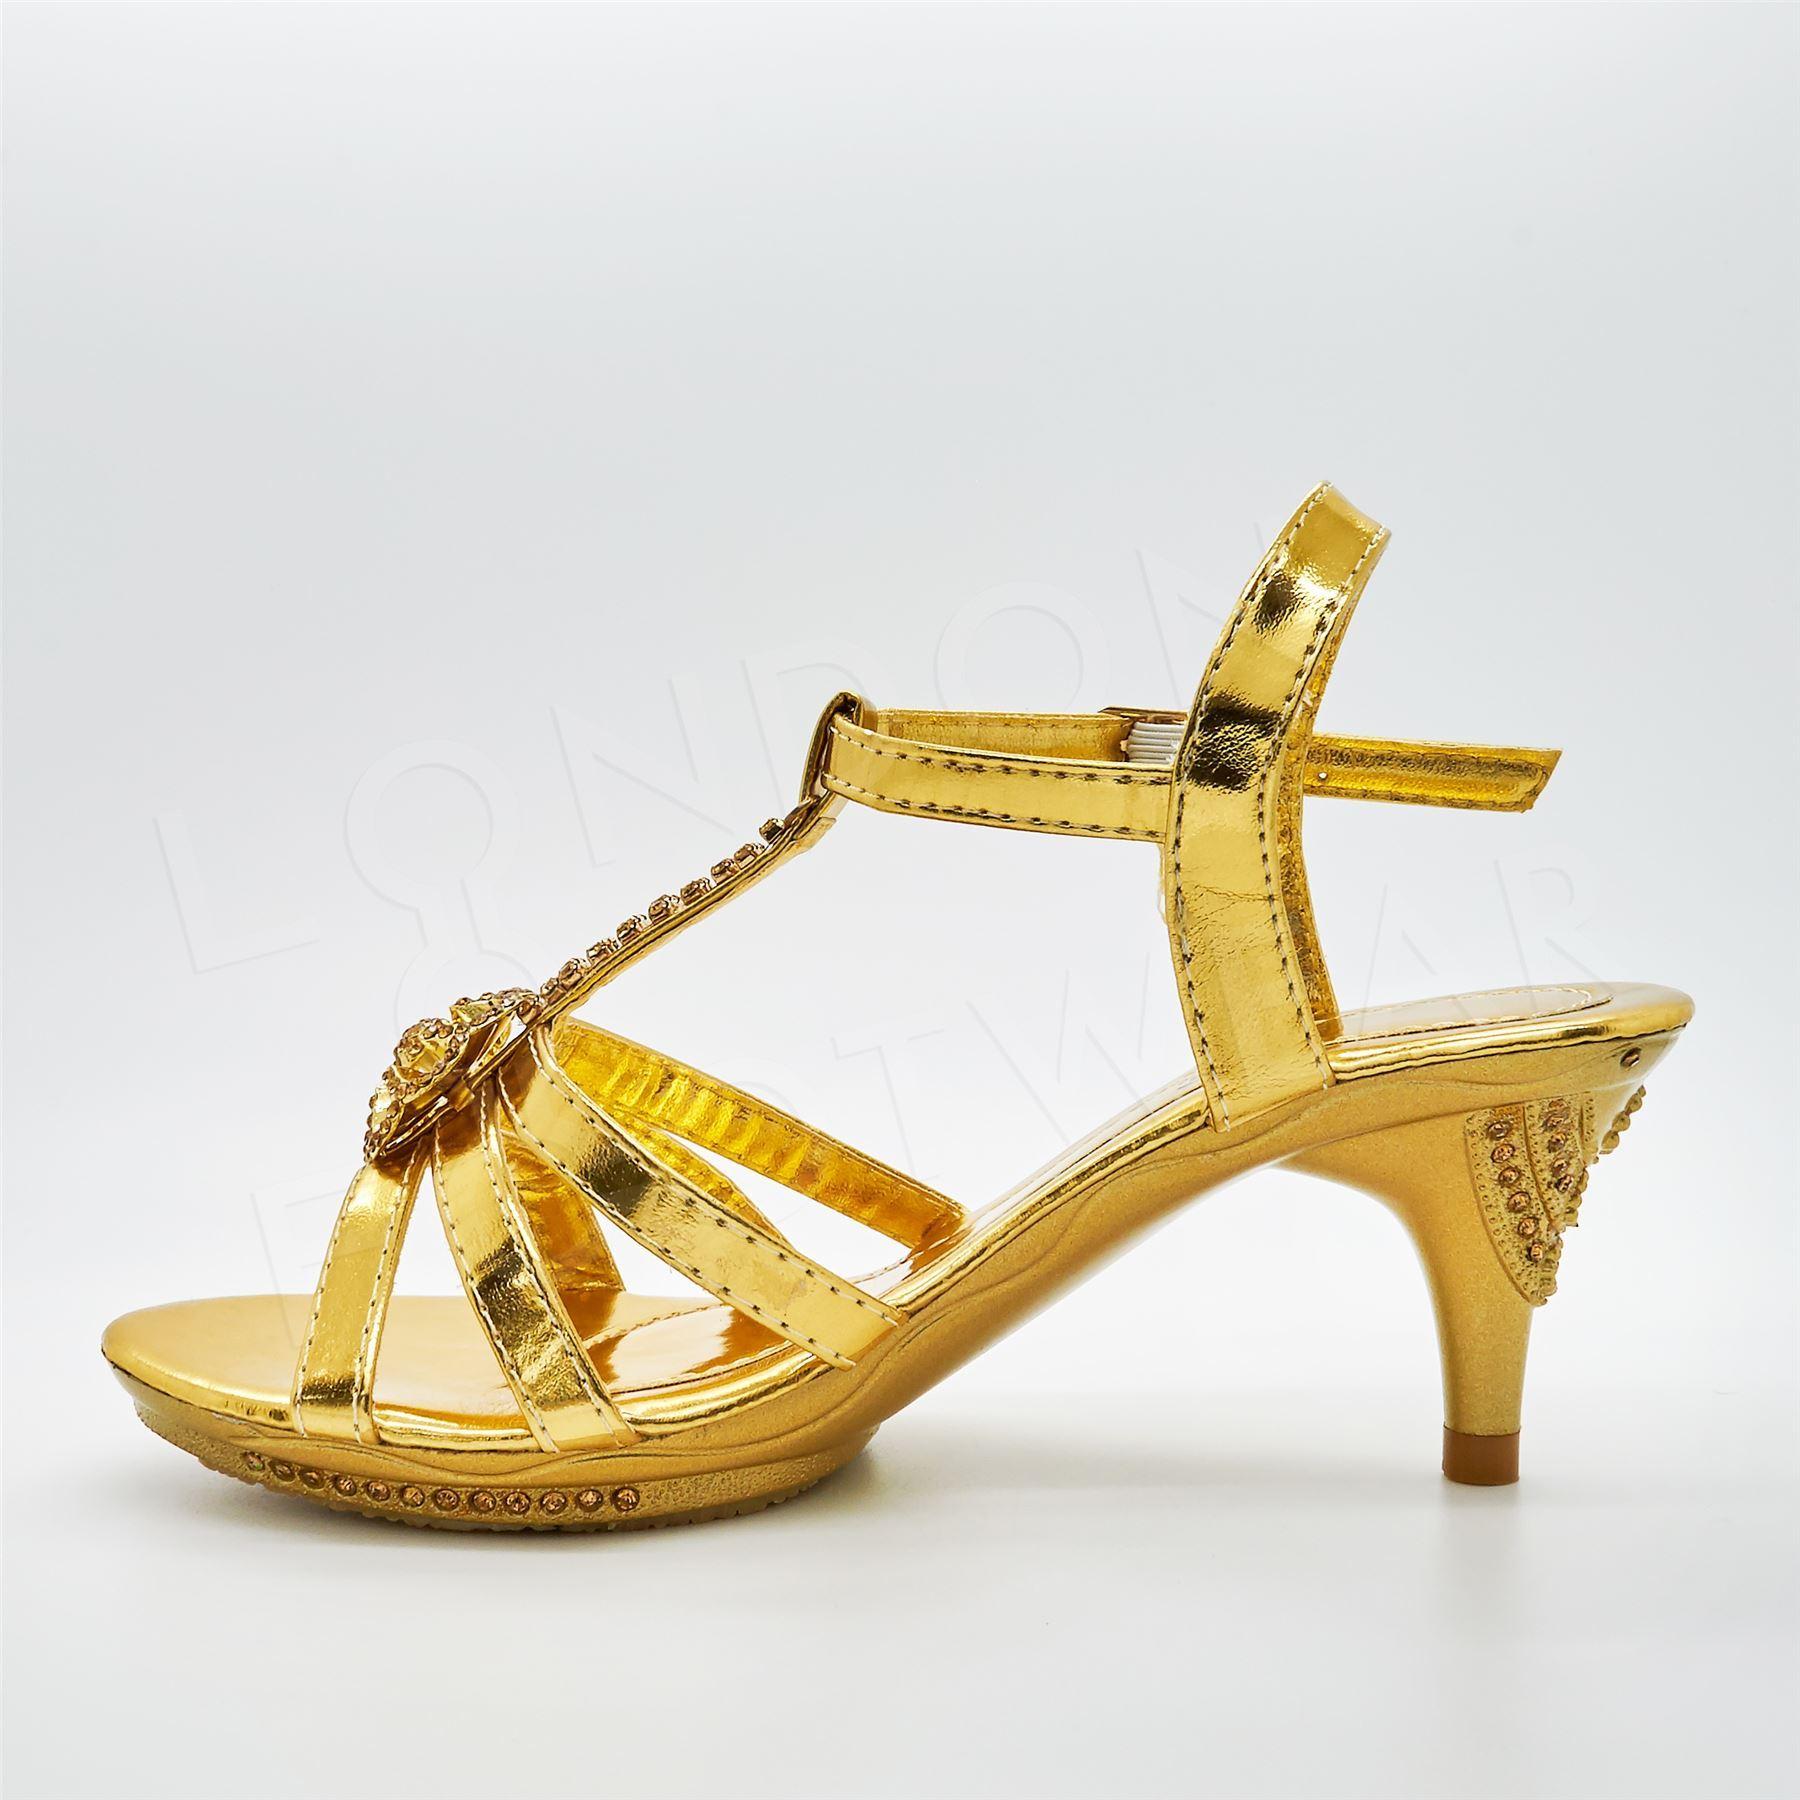 Girls Diamante Bridal Sandals Low Kitten Heel Shoes Party Bridesmaid Wedding UK